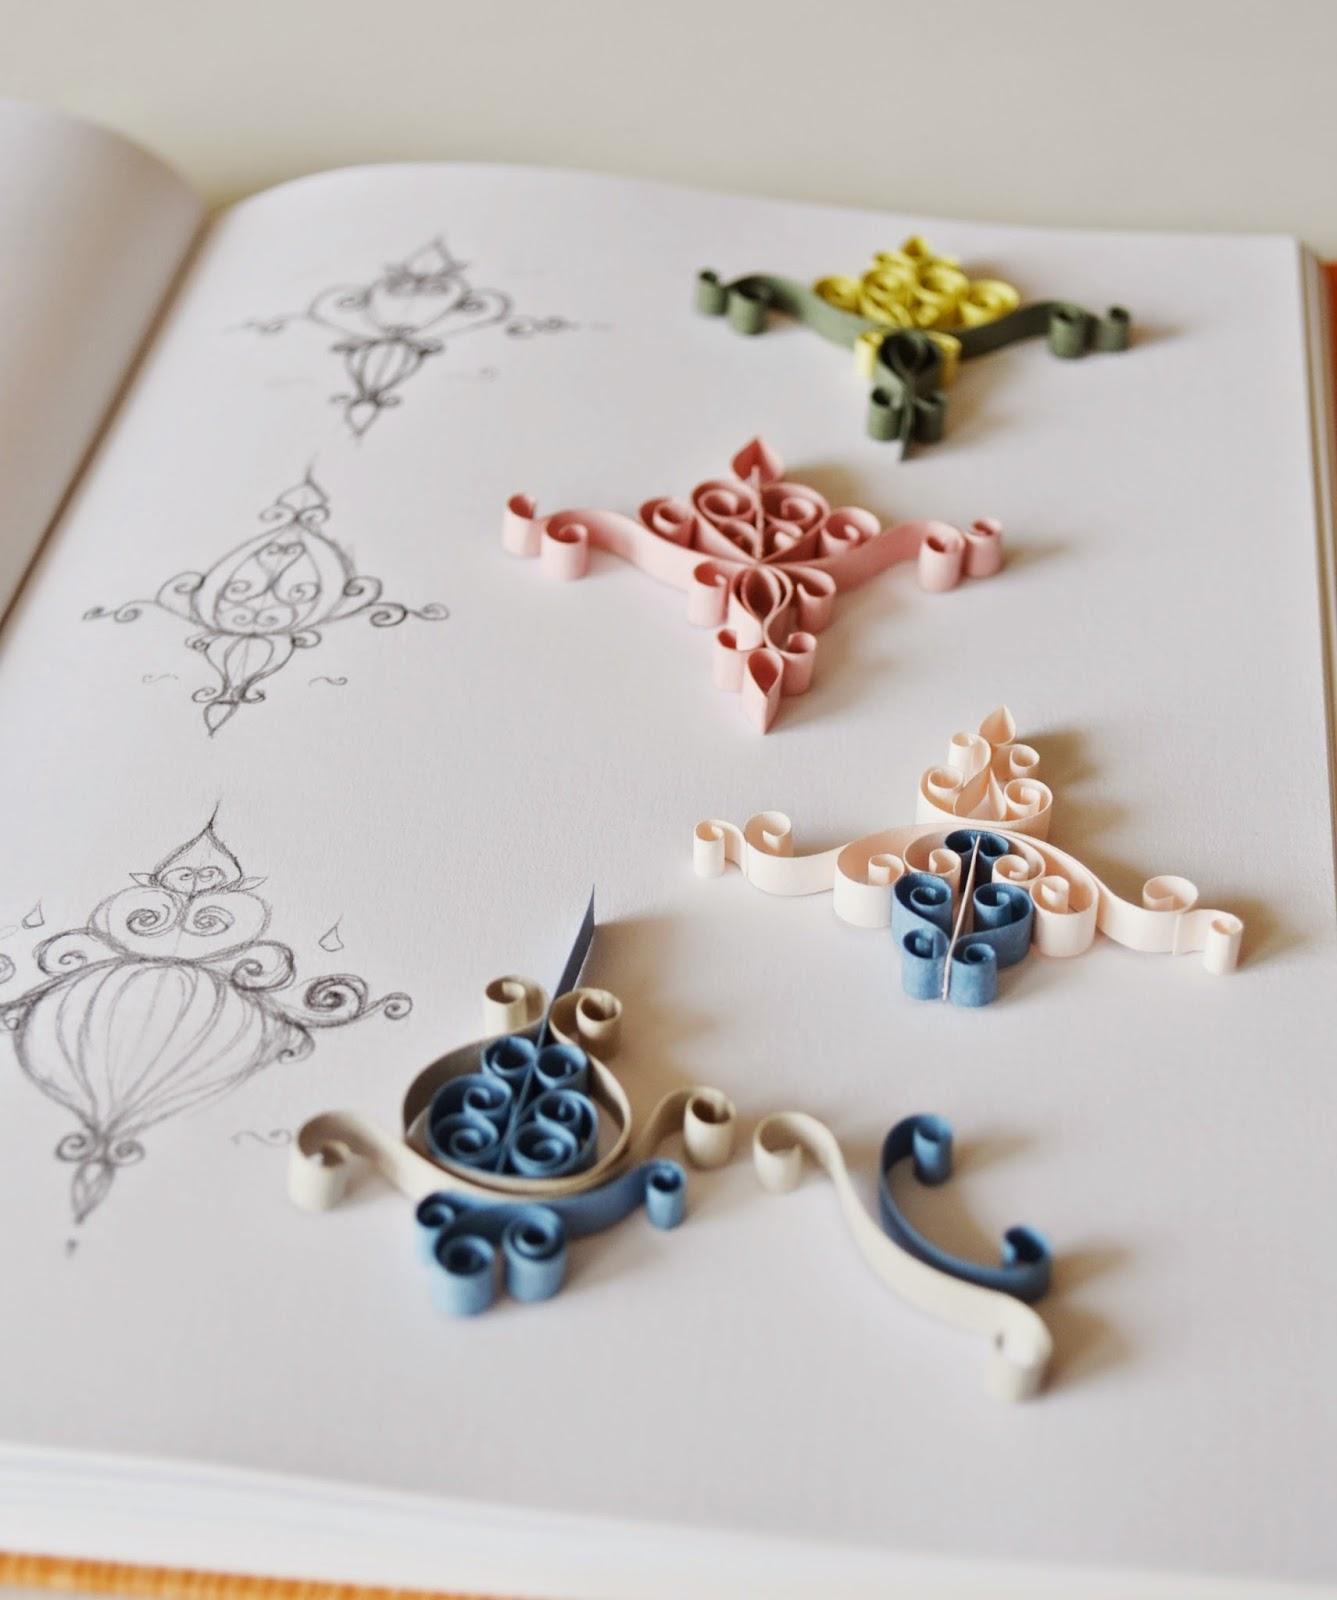 Ka tla k k eyler a new quilling collection sneak peek for Quilling patterns